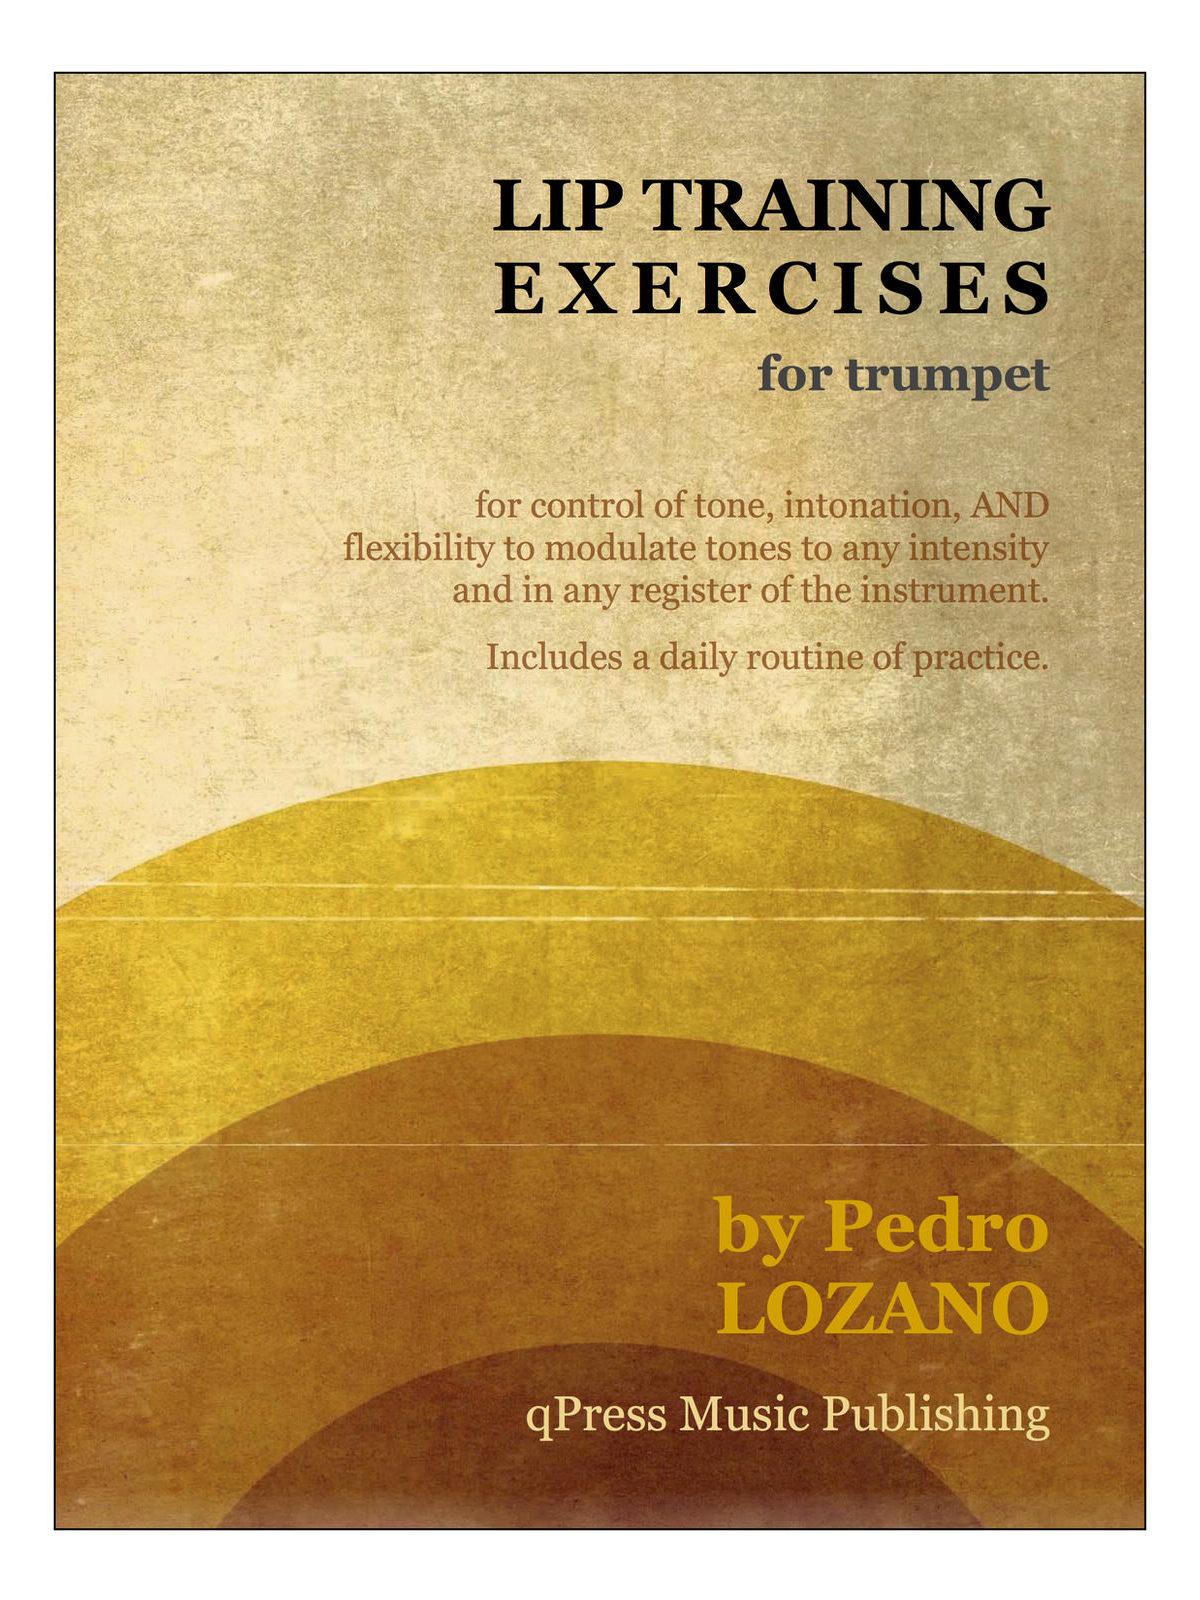 Lozano, Pedro, Lip Training Exercises